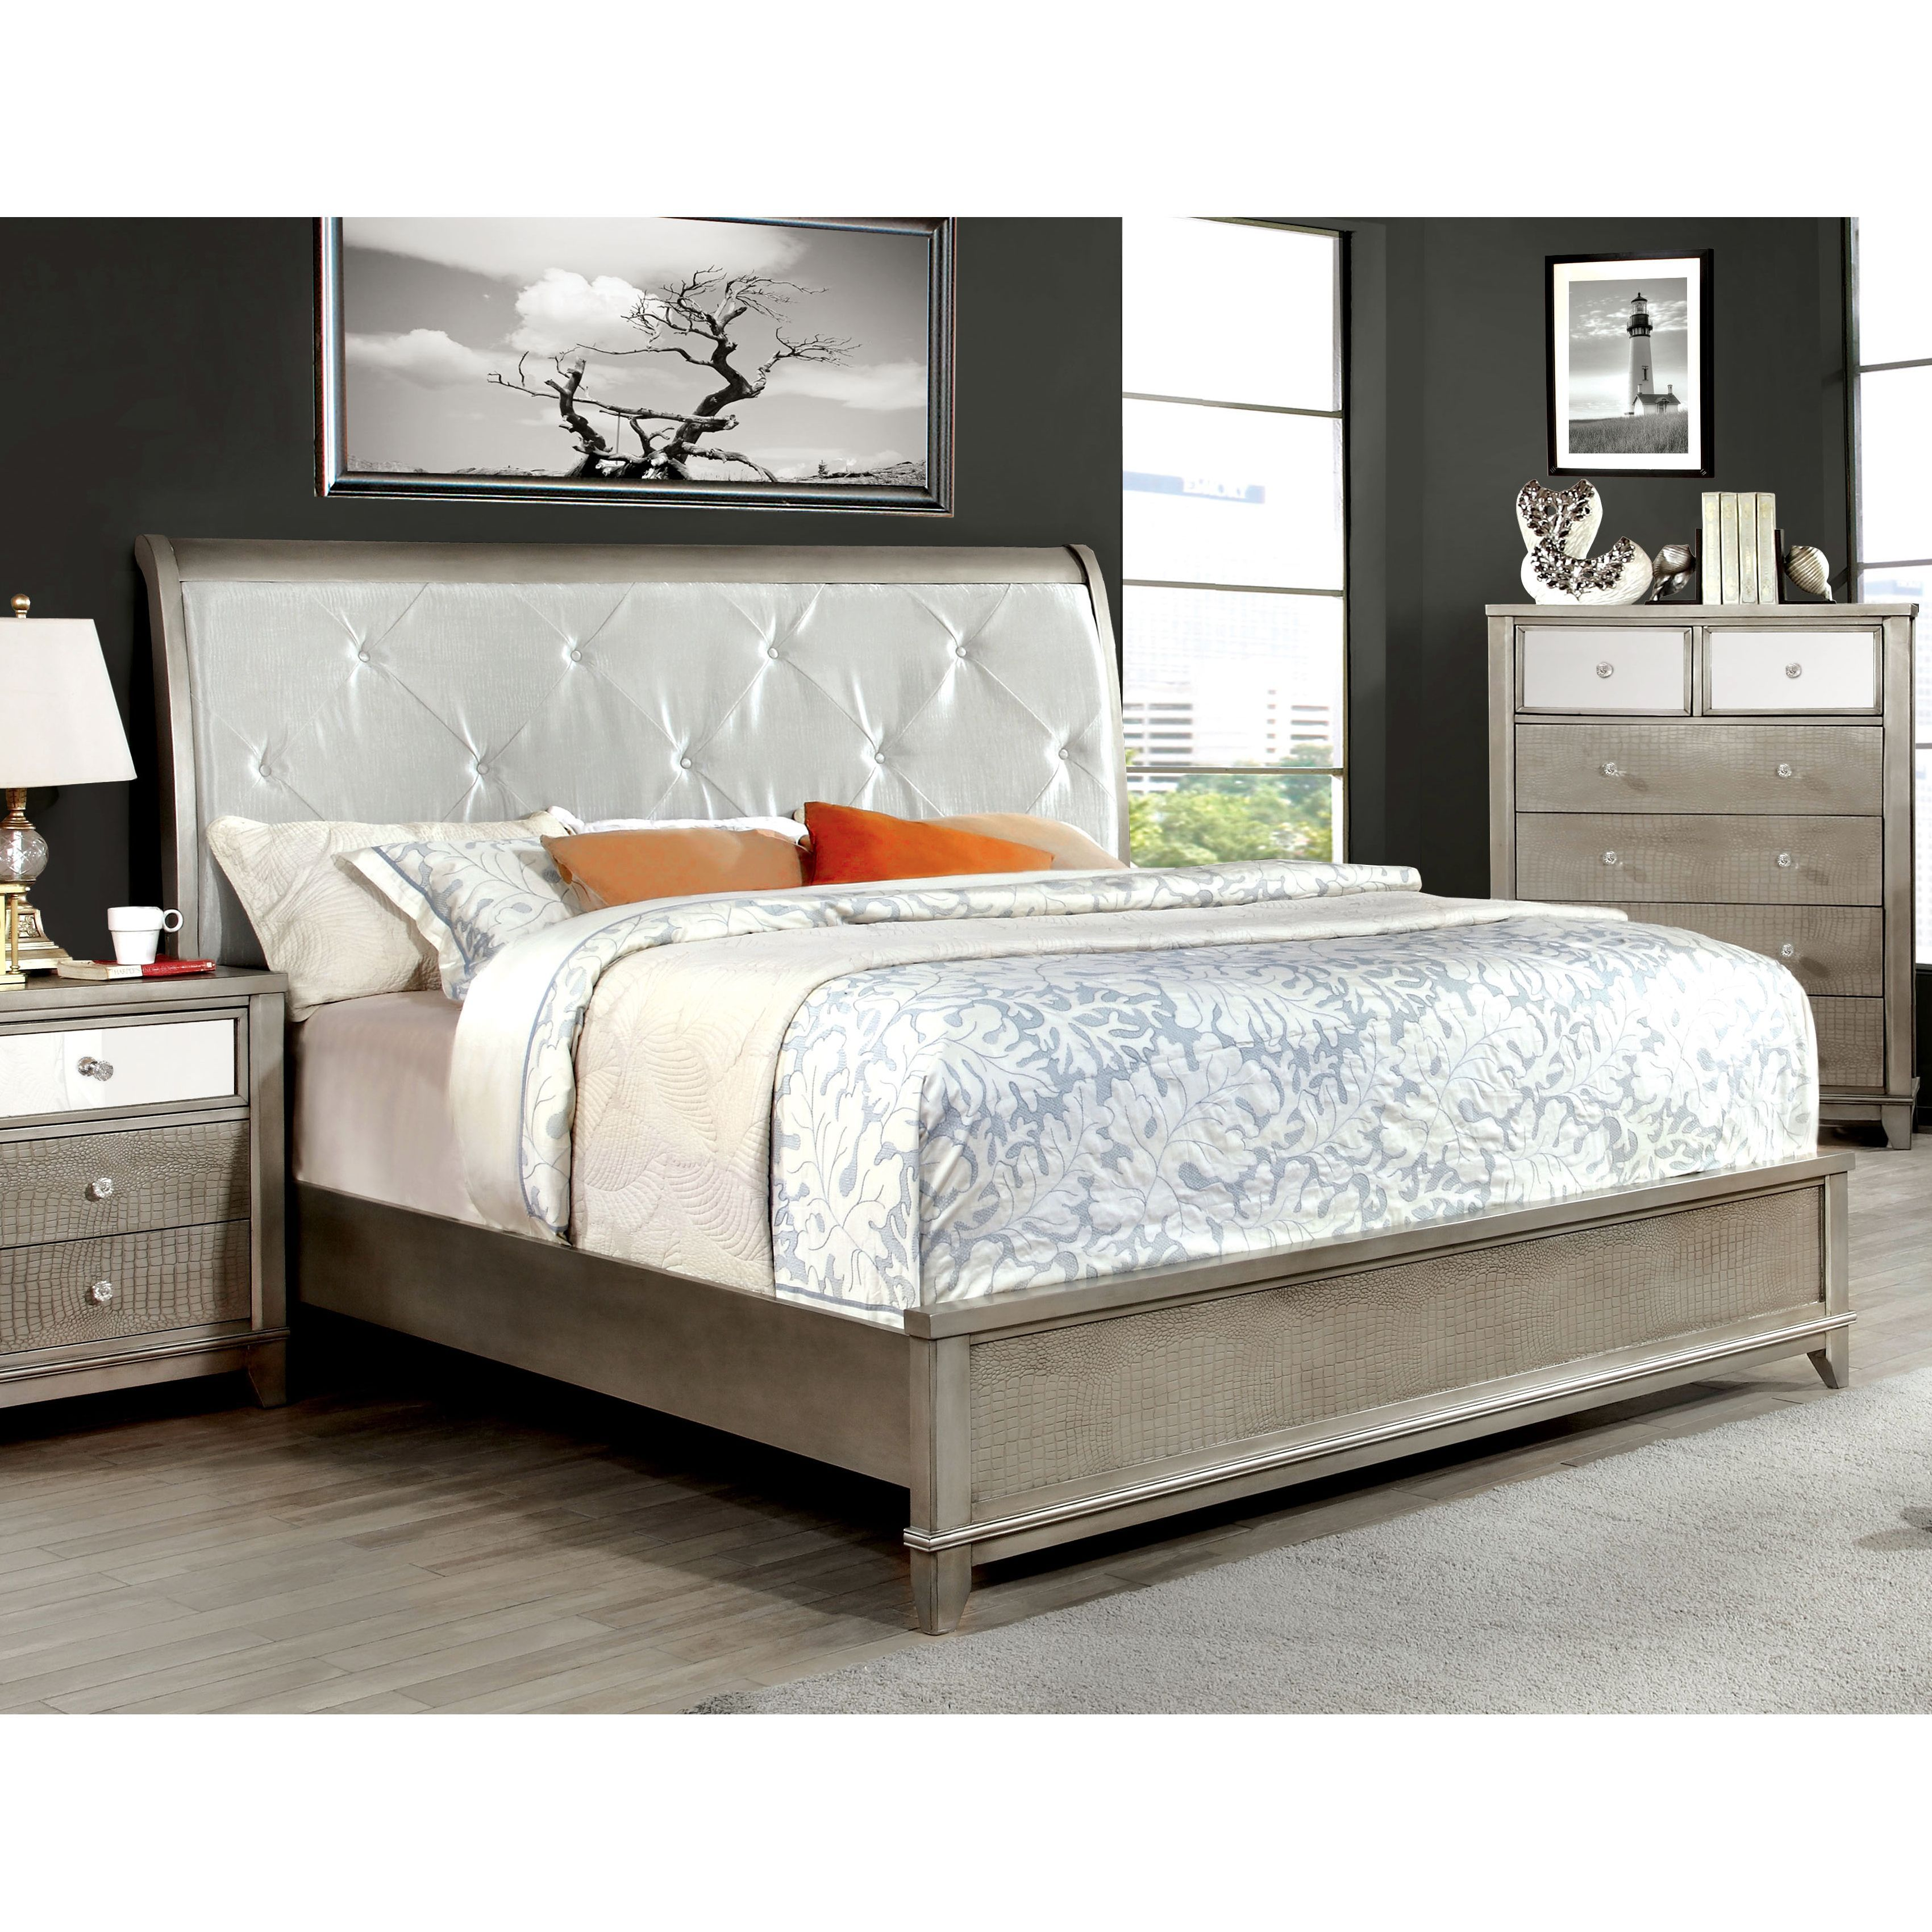 furniture of america divonne modern crocodile silver platform bed by